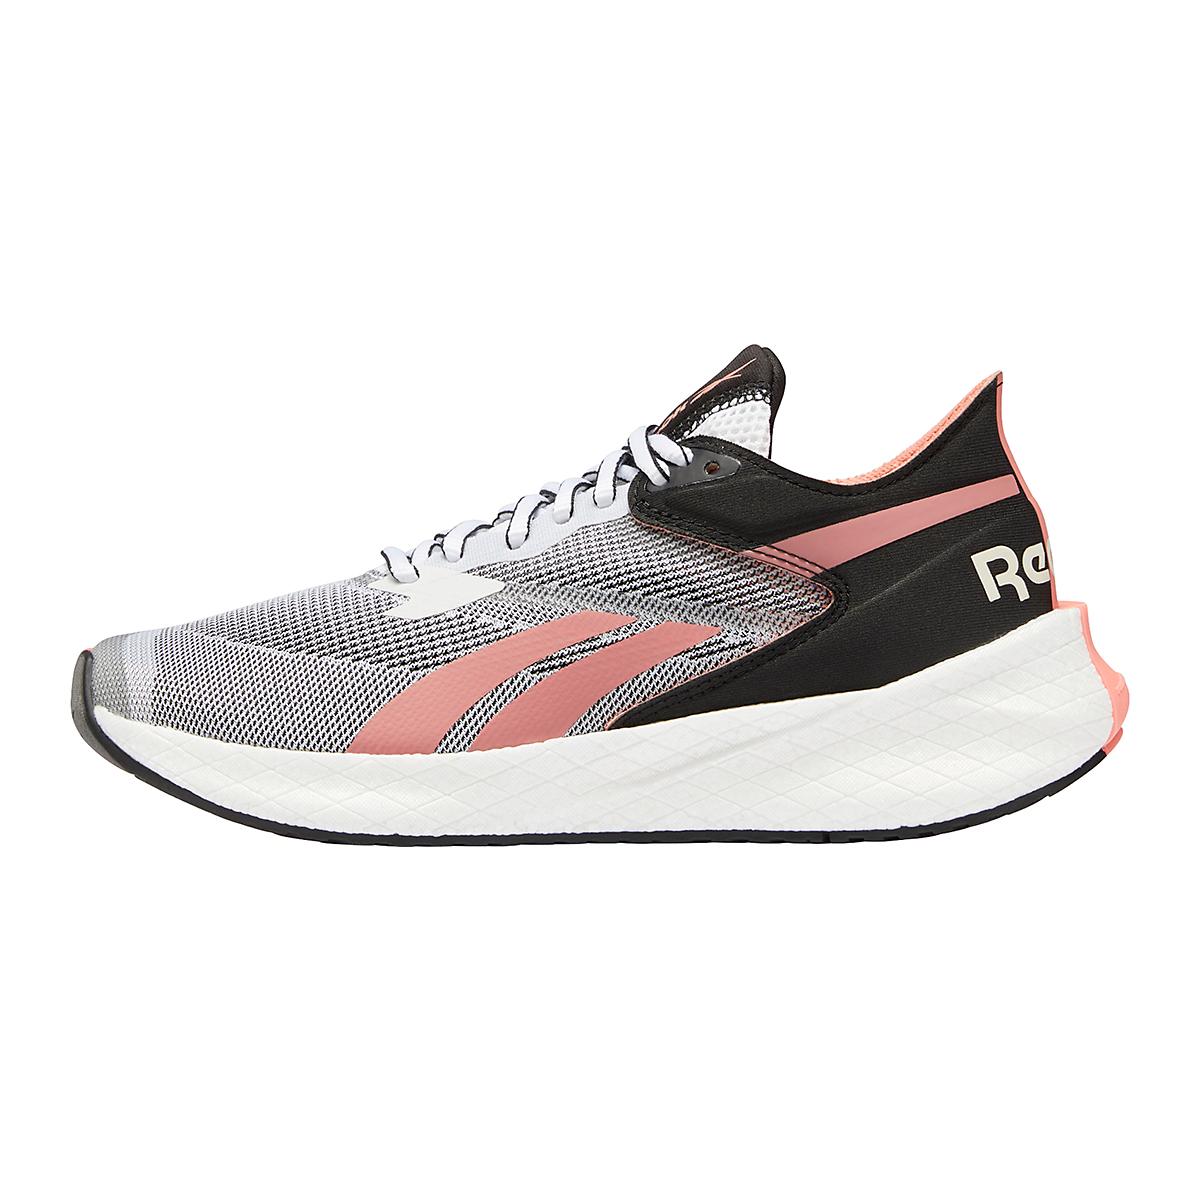 Women's Reebok Floatride Energy Symmetros Running Shoe - Color: White/Core Black/Twisted Coral - Size: 6.5 - Width: Regular, White/Core Black/Twisted Coral, large, image 2